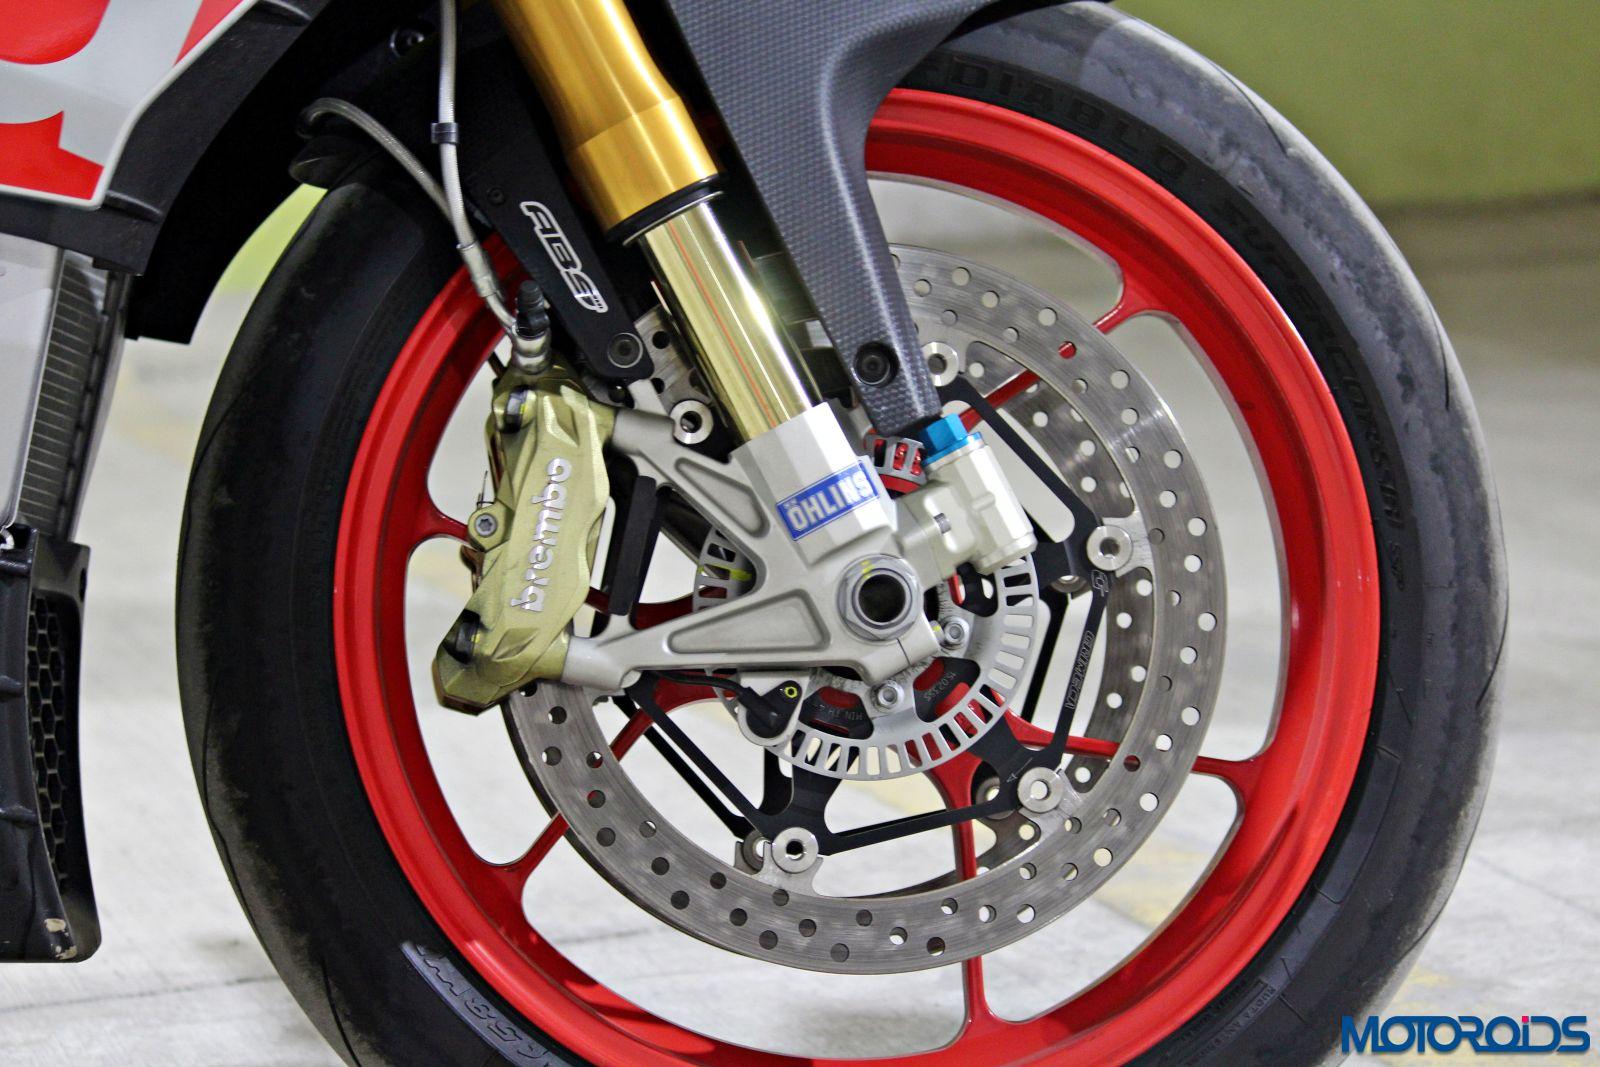 Aprilia Tuono V4 1100 Factory Review - Details and Stills (26)